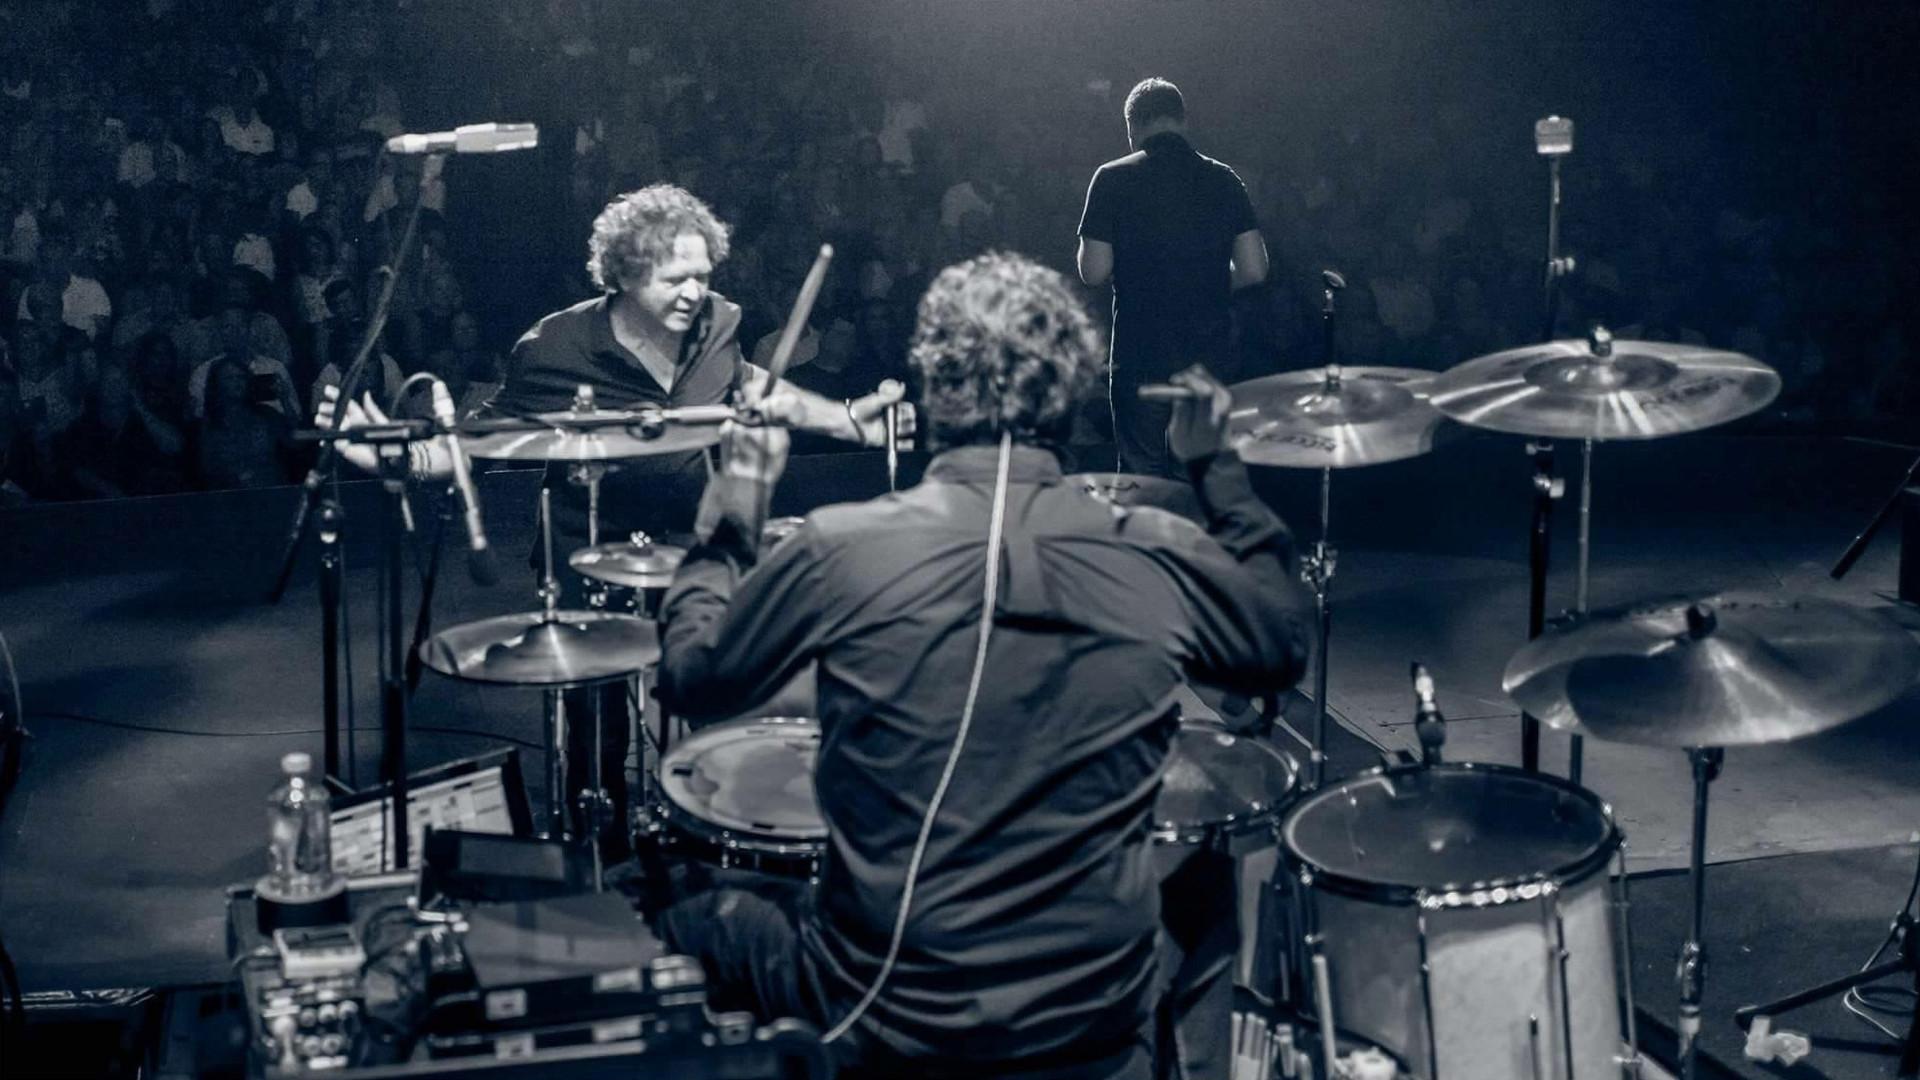 Big Love Tour 2015/16